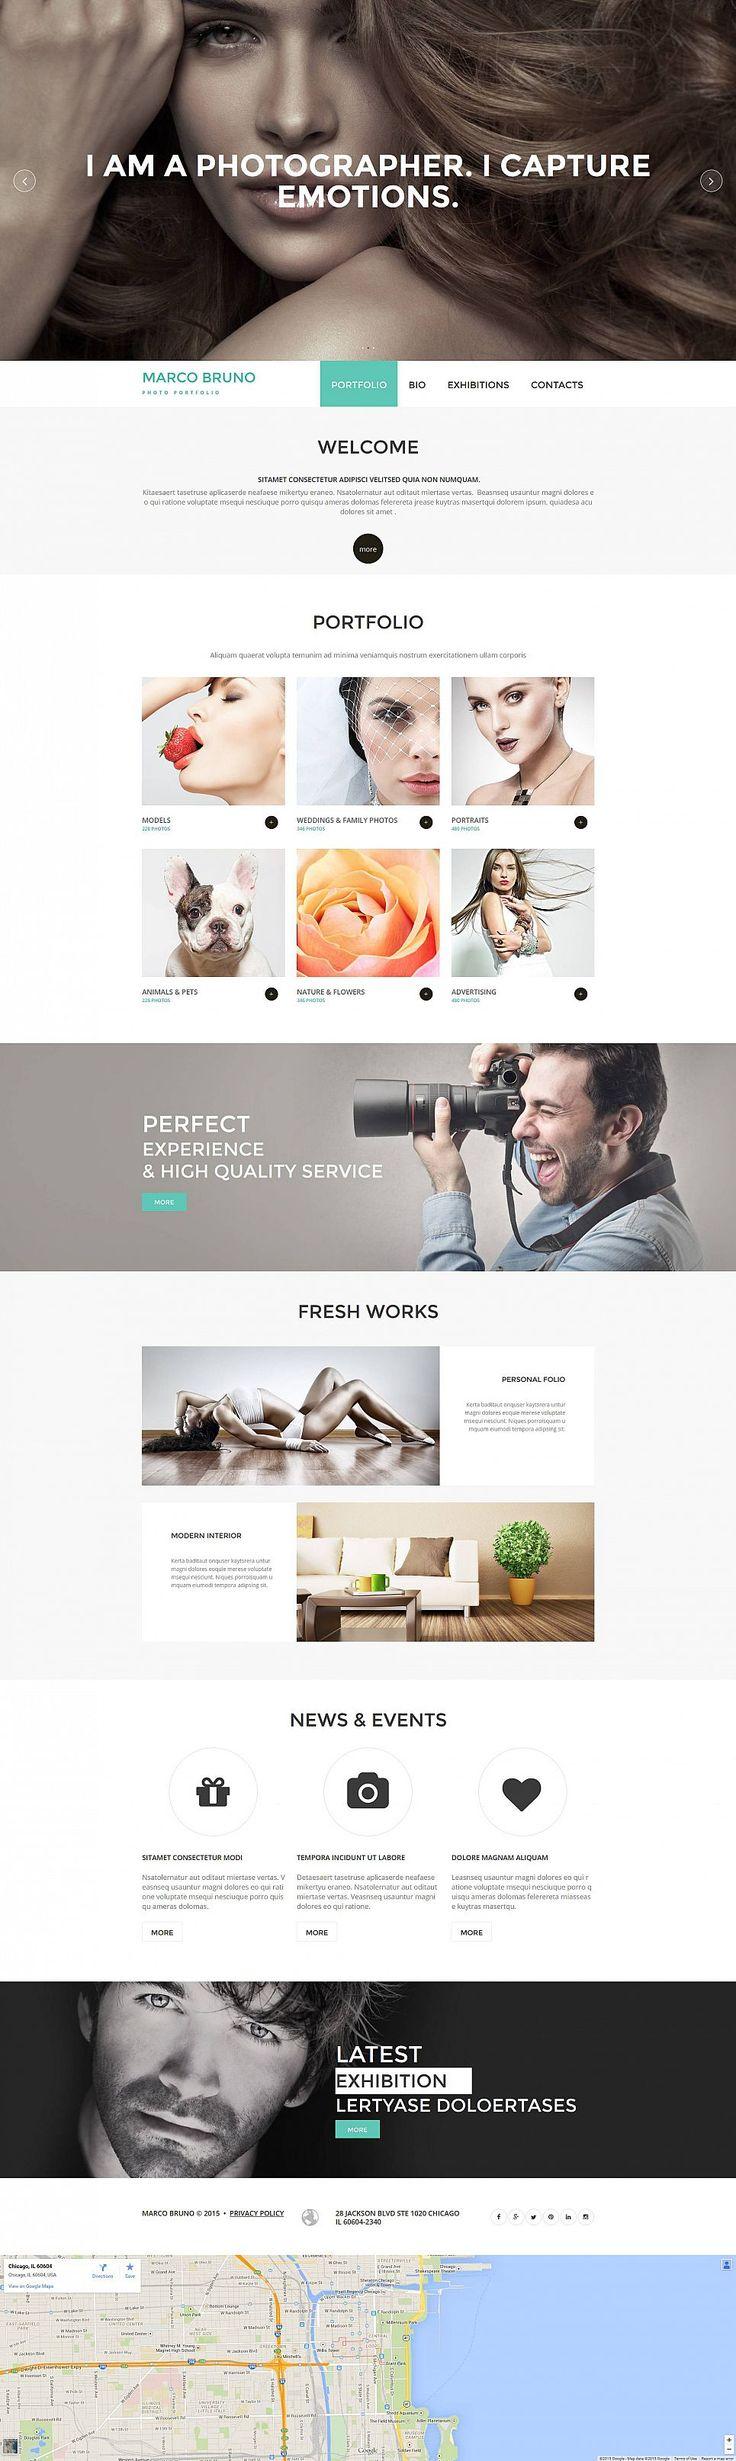 Best Photo Portfolio Design Images On Pinterest Portfolio - Fresh artist bio template design